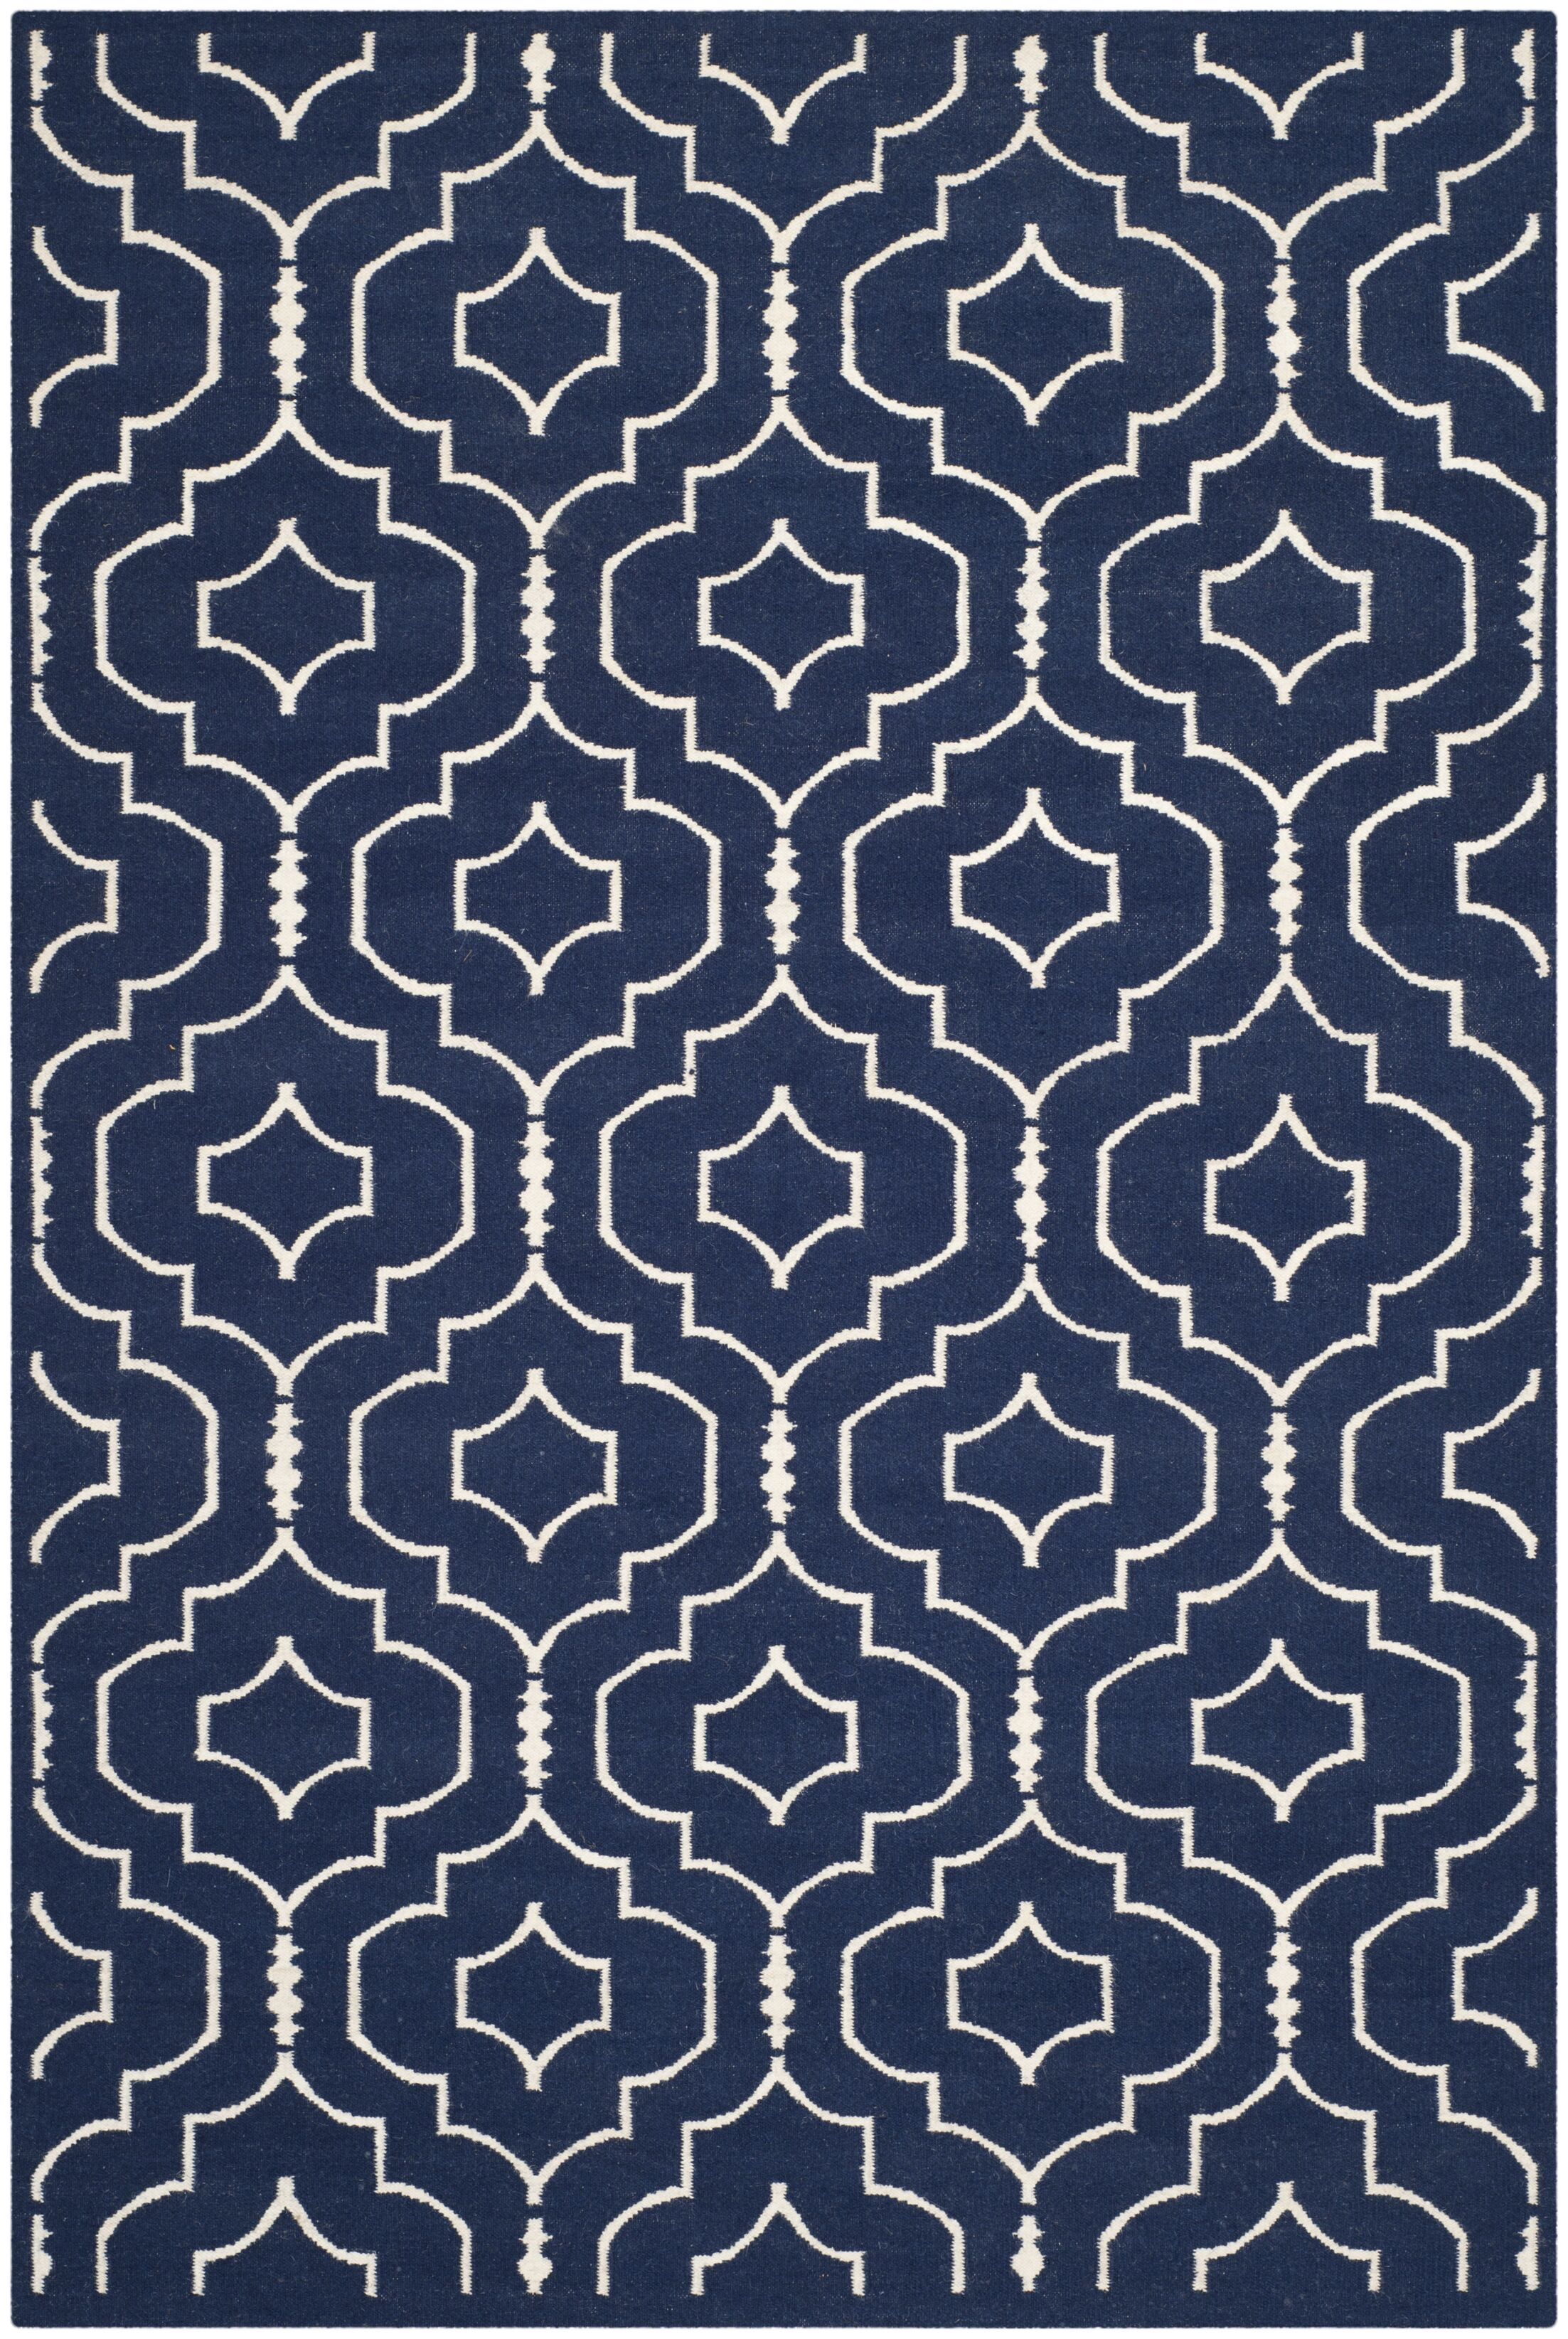 Dhurries Navy / Ivory Geometric Area Rug Rug Size: Rectangle 6' x 9'